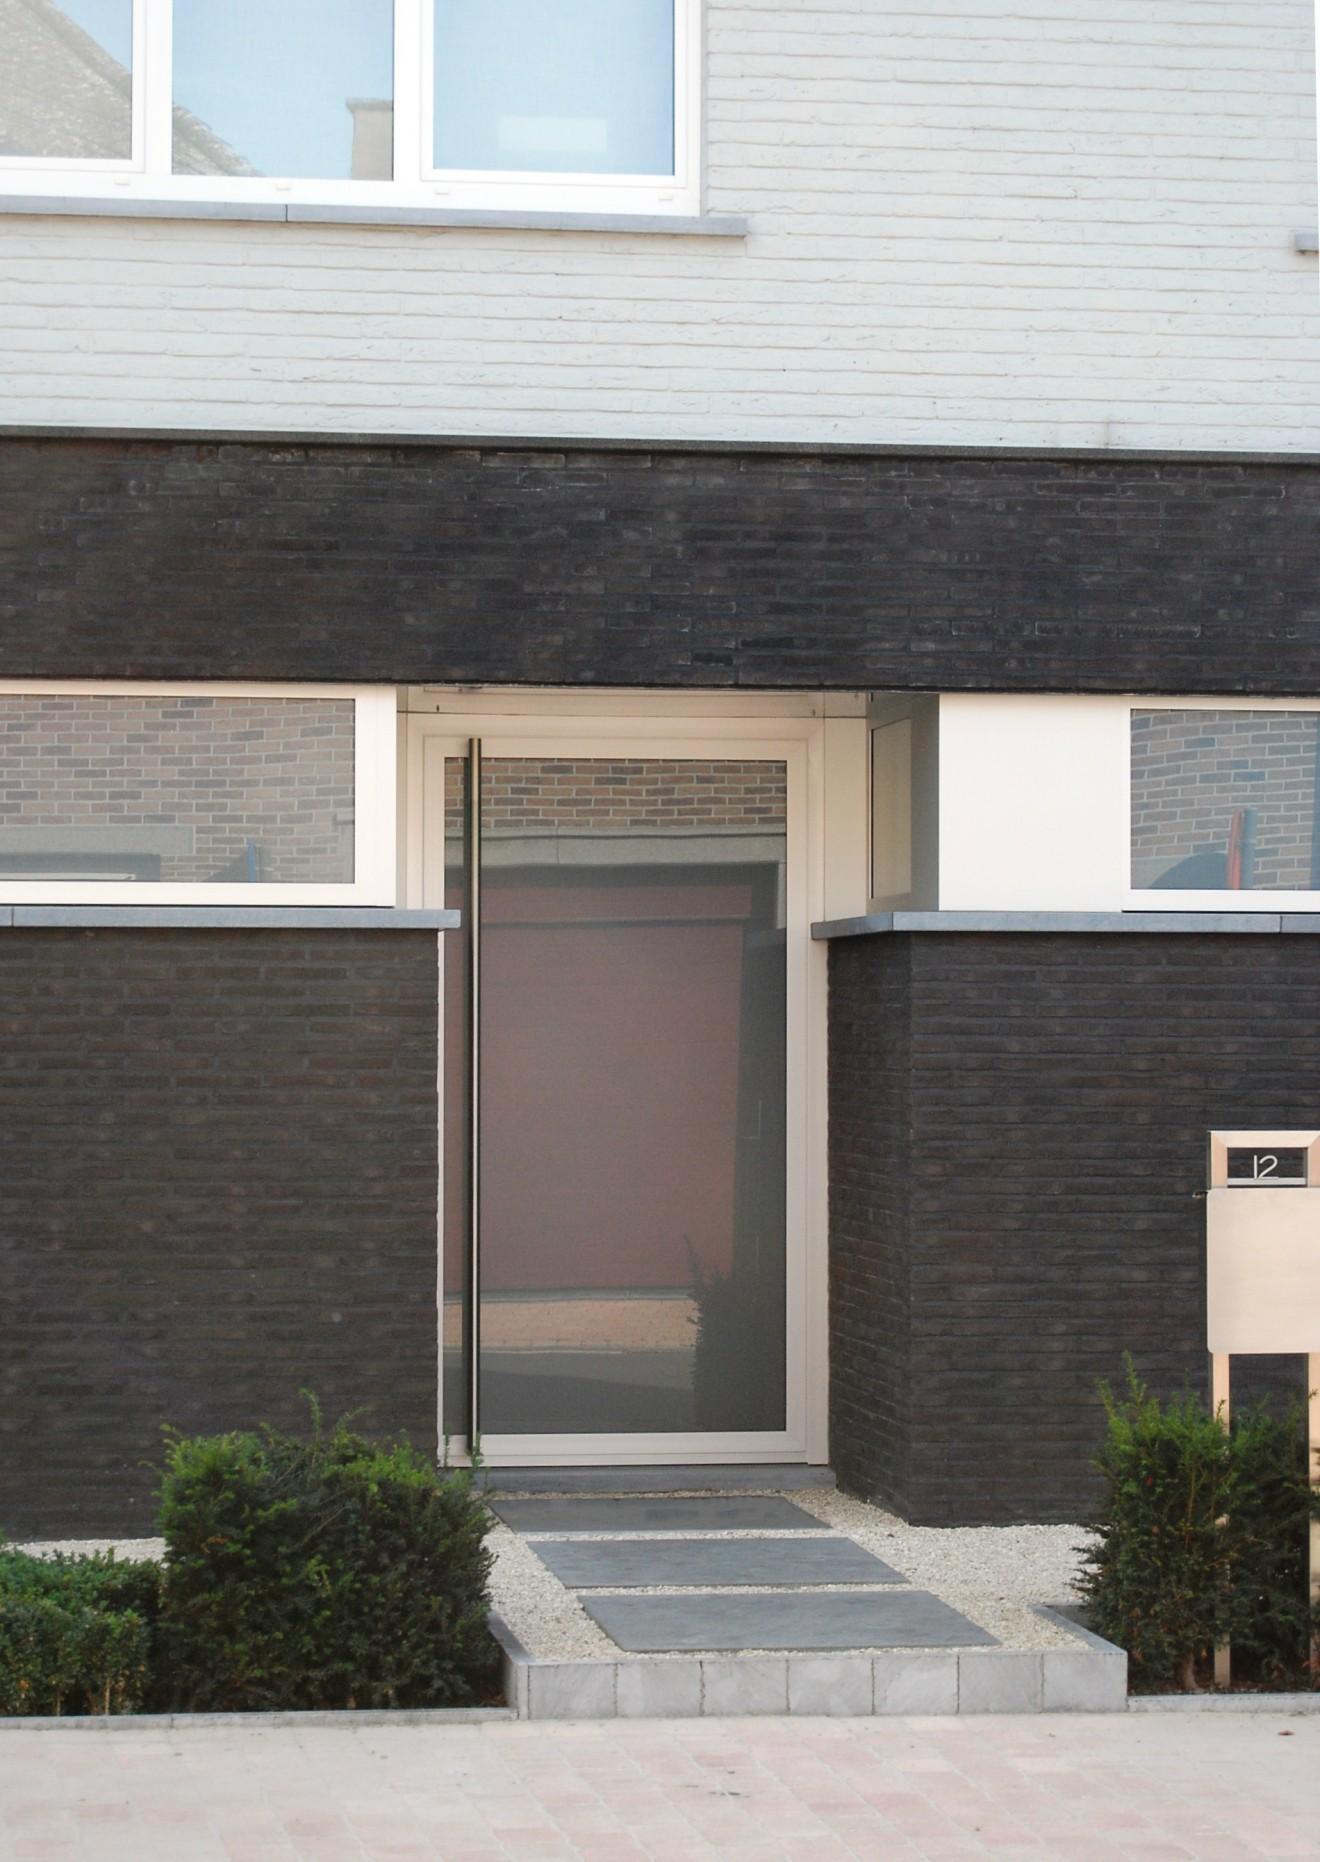 Architect- en ingenieursbureau Andries & Vuylsteke - Verbouwing winkelpand naar gezinswoning